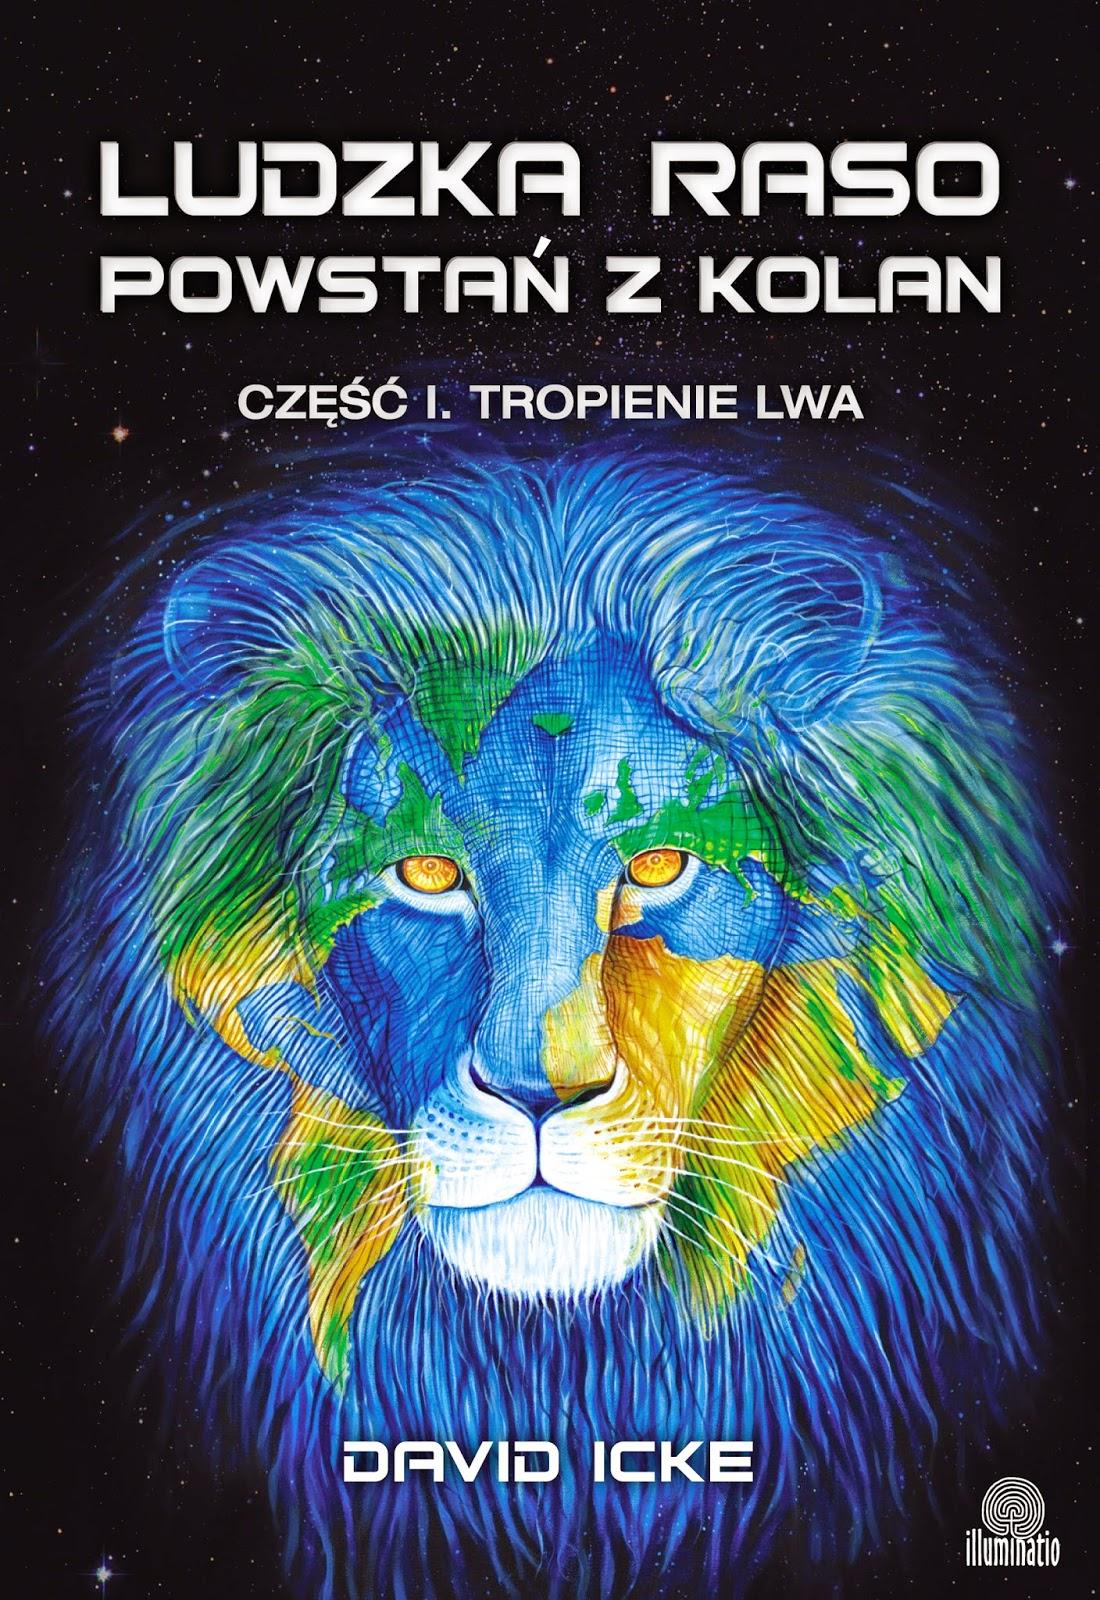 http://www.illuminatio.pl/ksiazki/ludzka-raso-powstan-z-kolan/